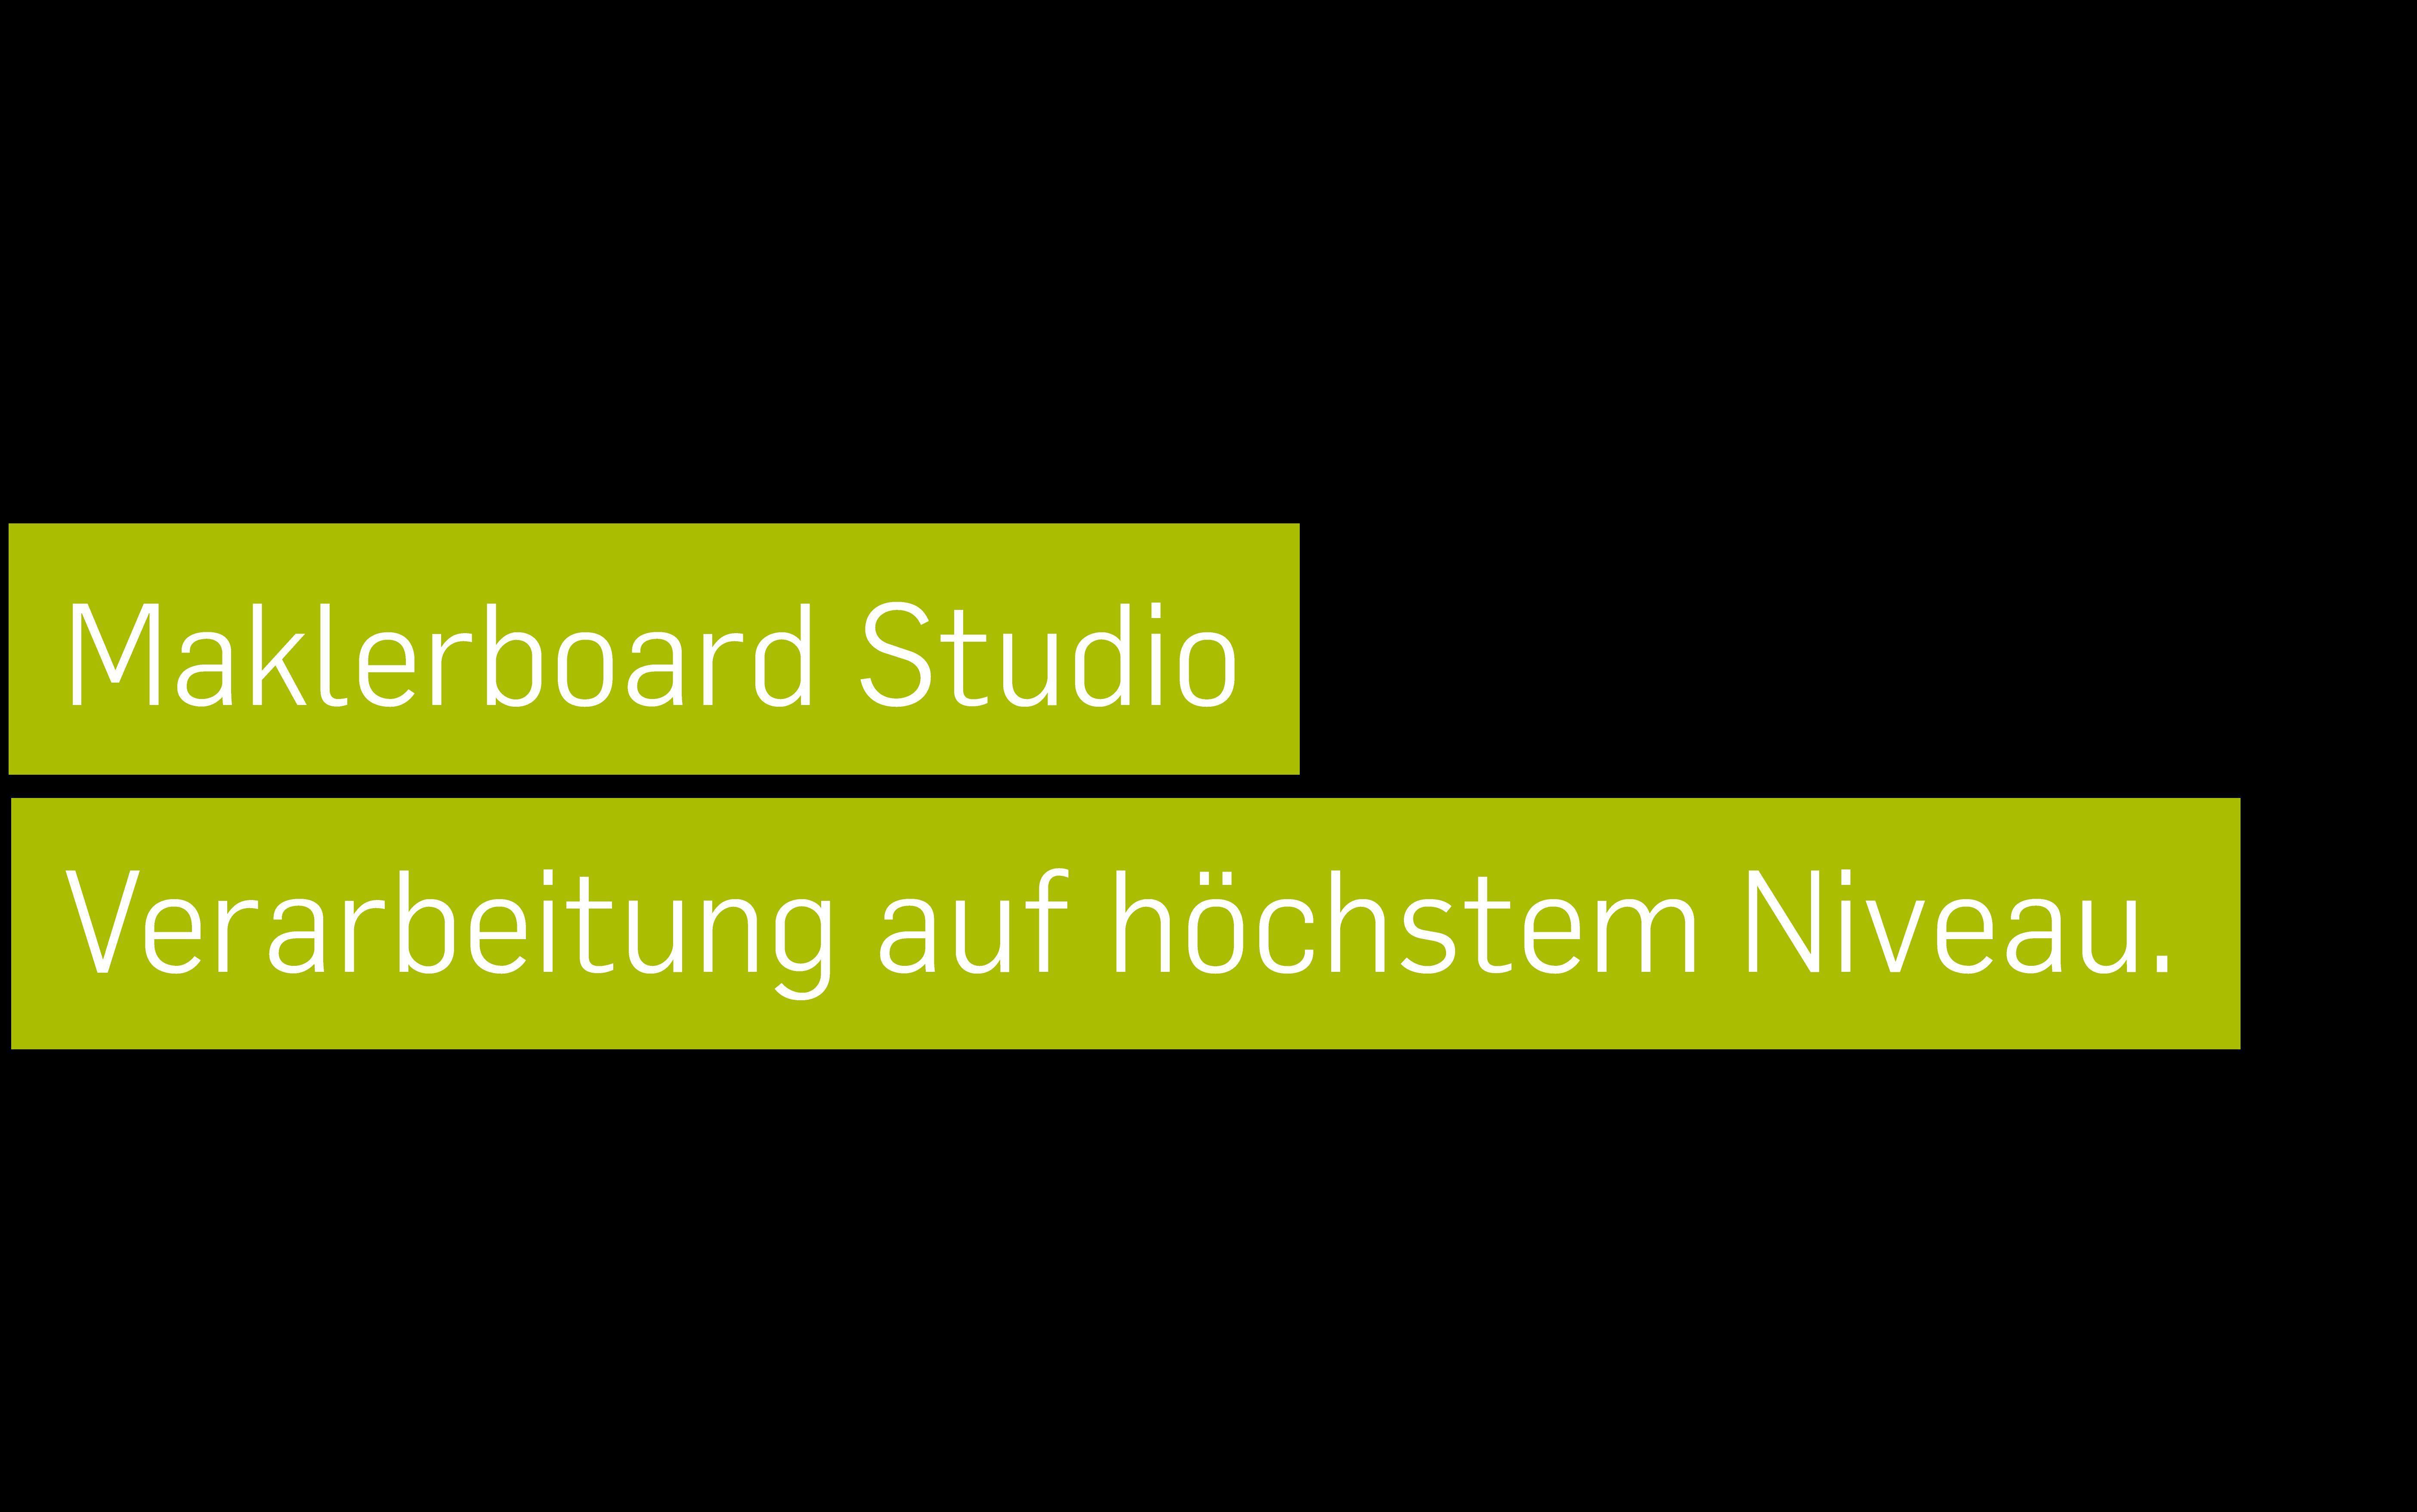 Maklerboard Studio